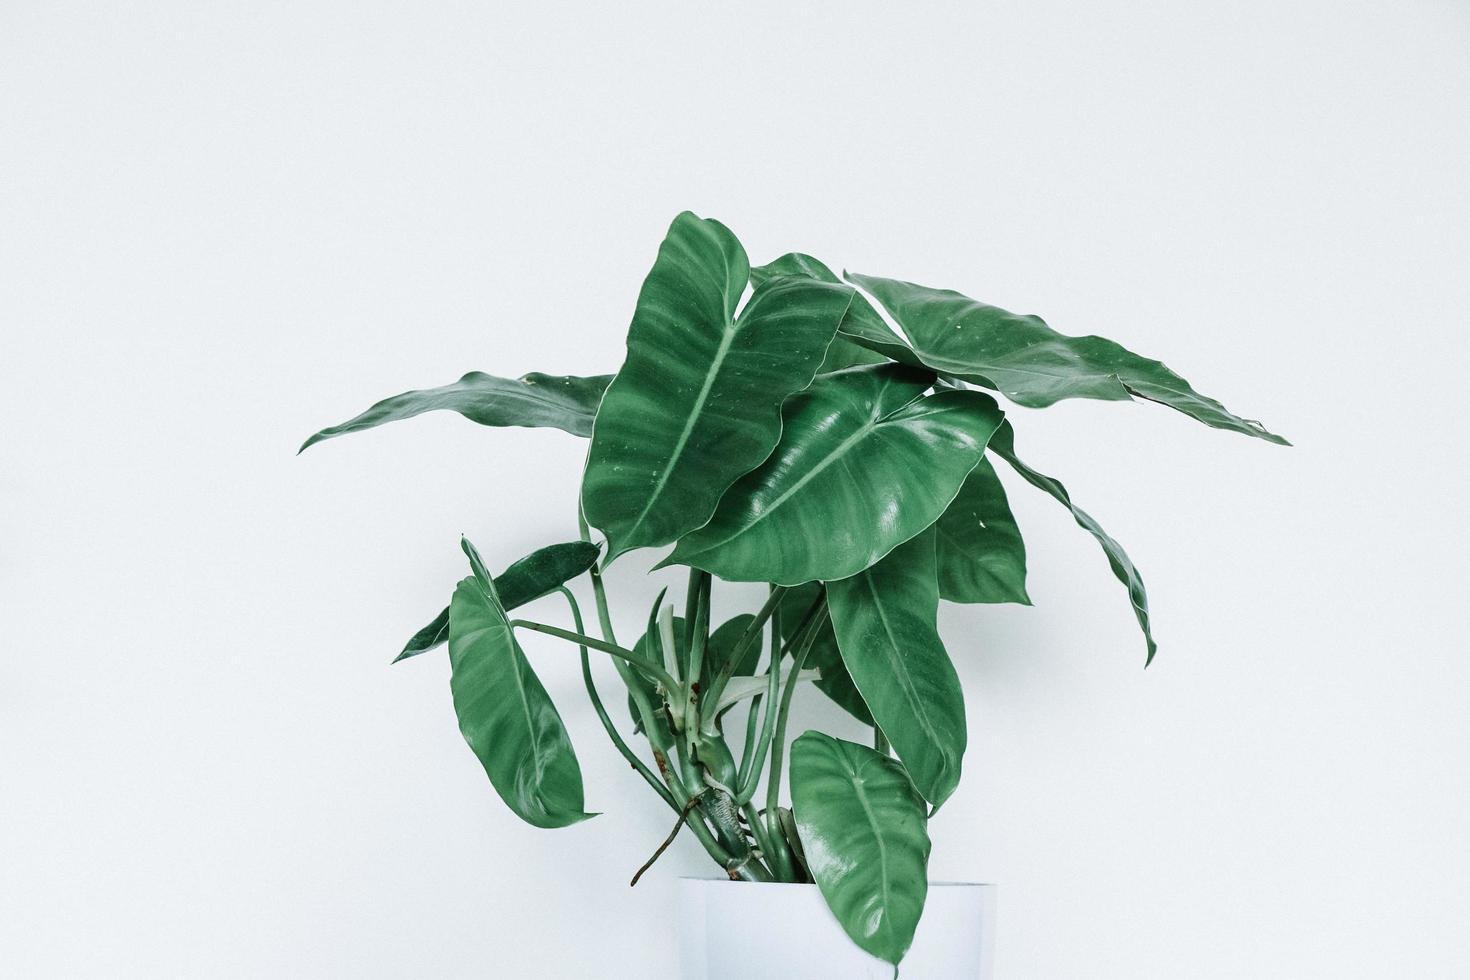 Philodendron Burle Marx foto